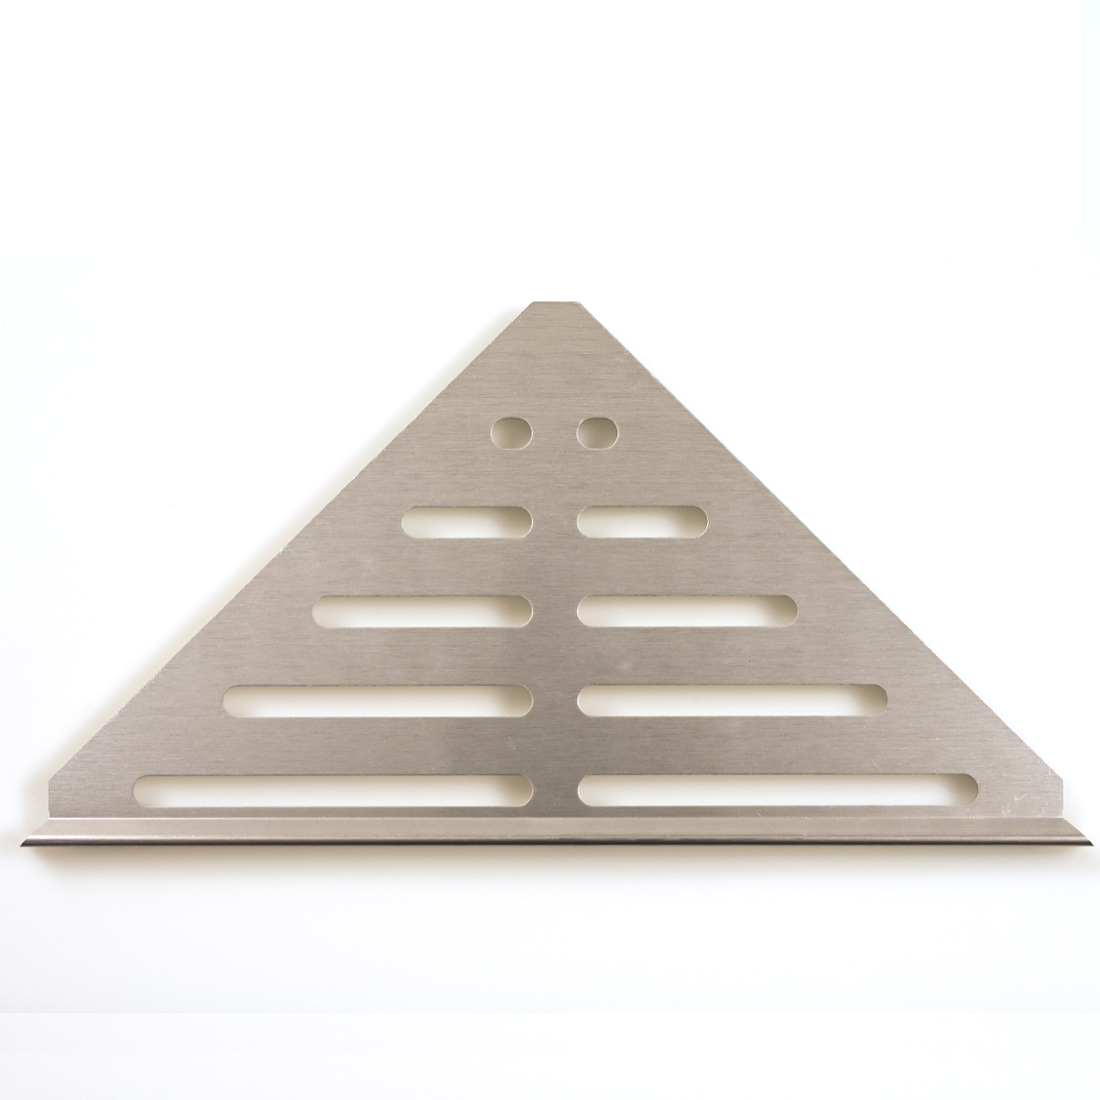 Brushed Nickel Metal Corner Shelf (Shower Corner Caddy)